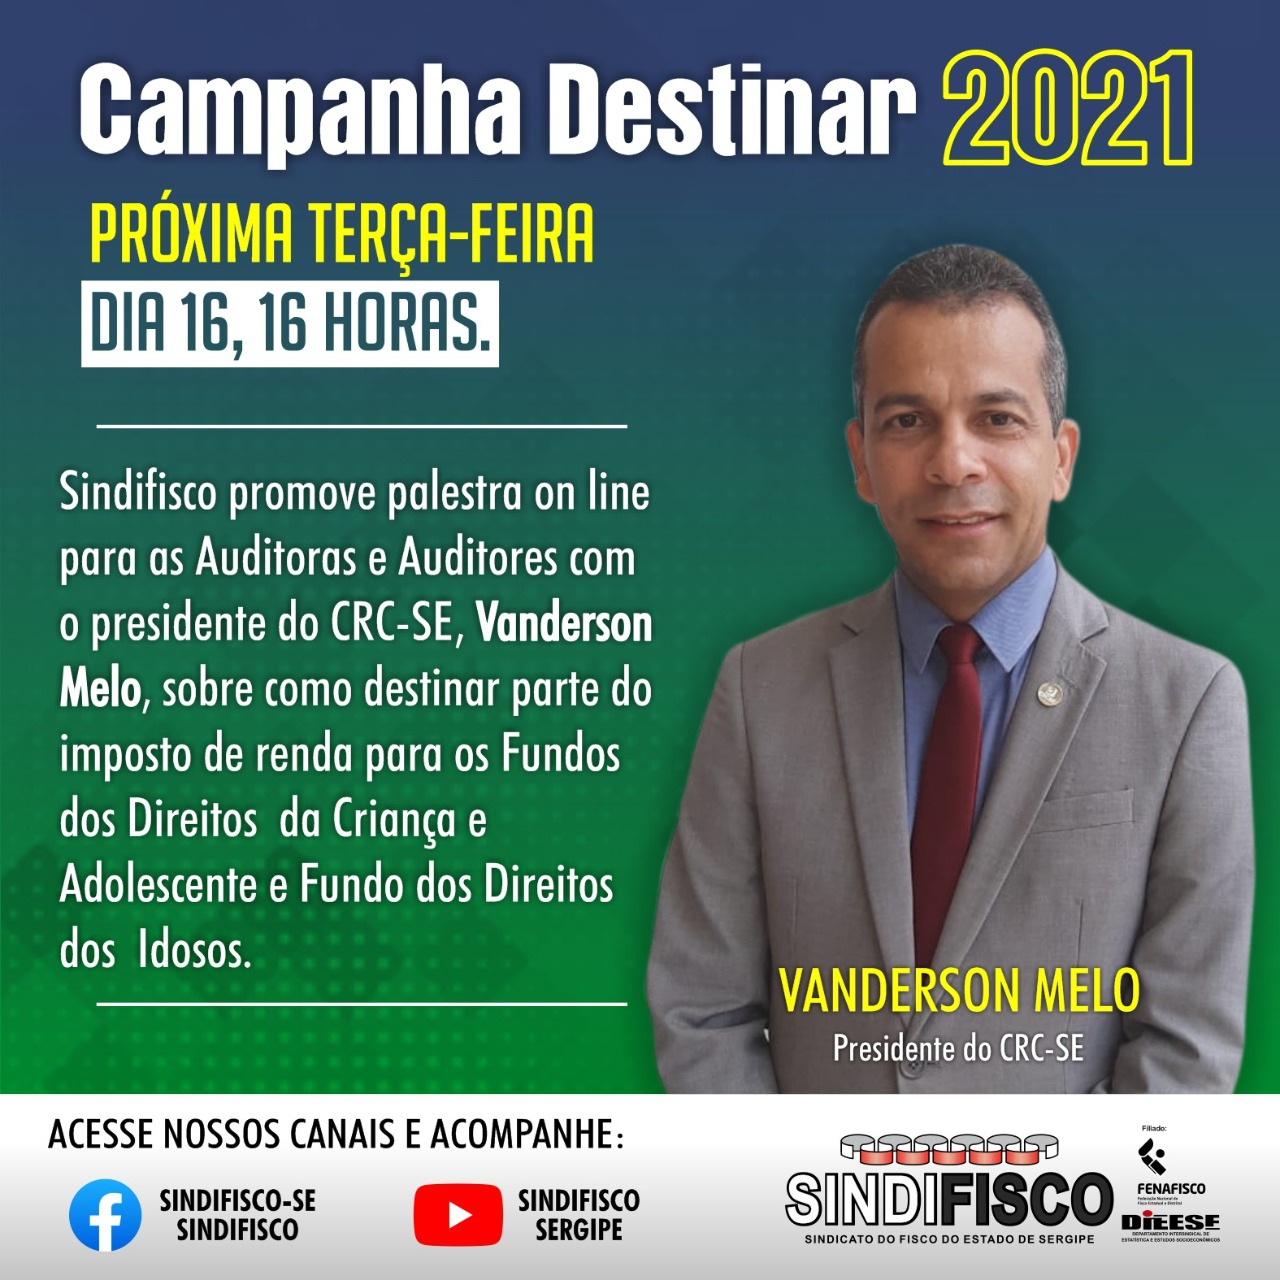 CampanhaDestinar-WEB.jpg